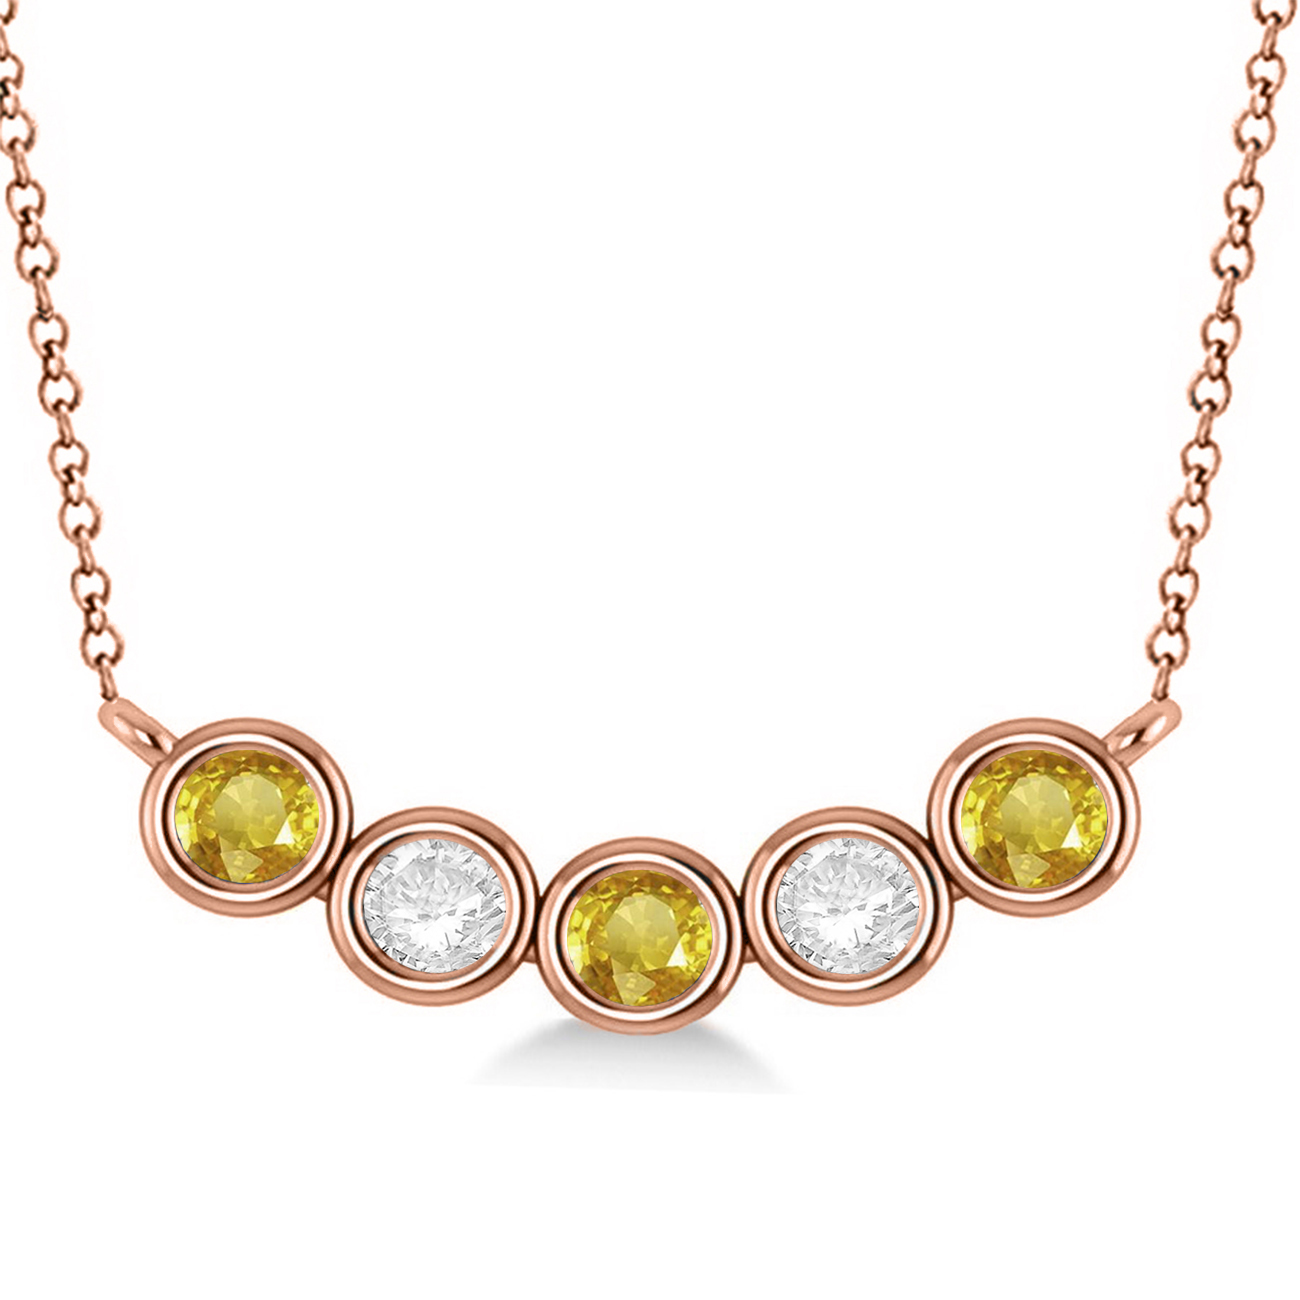 diamond amp yellow sapphire 5stone pendant necklace 14k